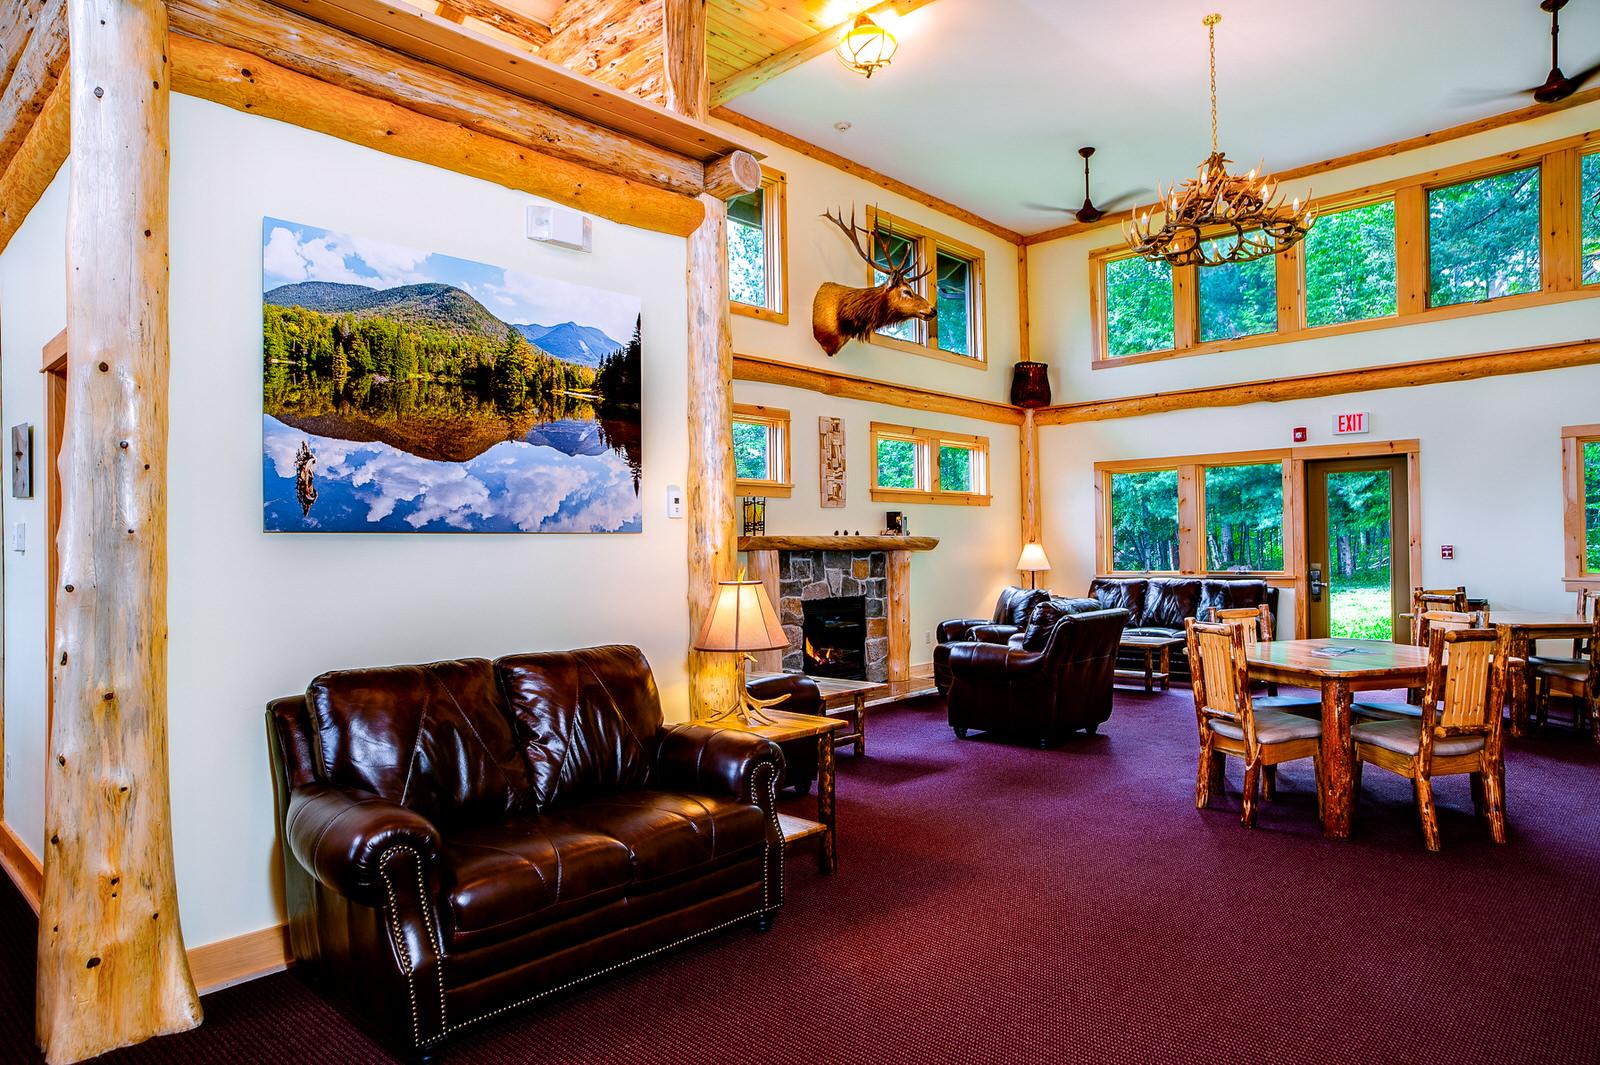 Adk-Spruce-Lodge-2048px-43.jpg